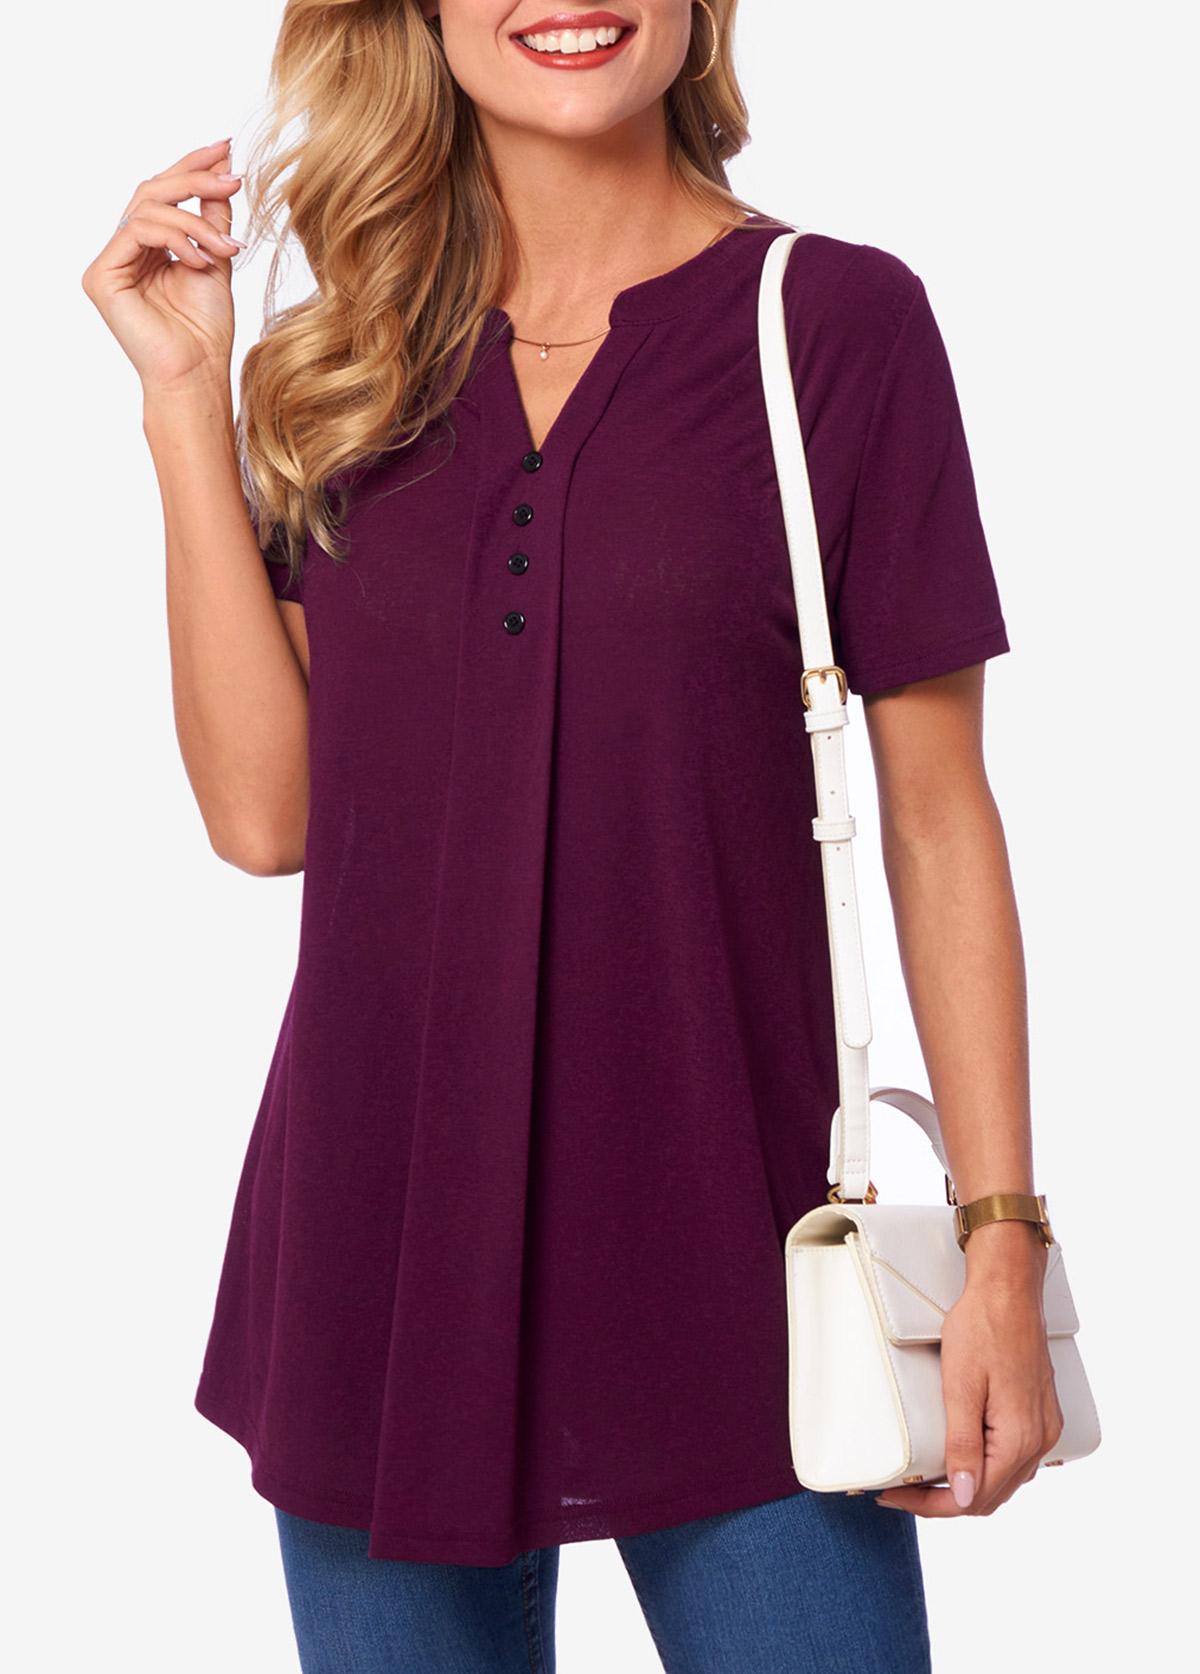 Solid Deep Purple Short Sleeve Split Neck T Shirt